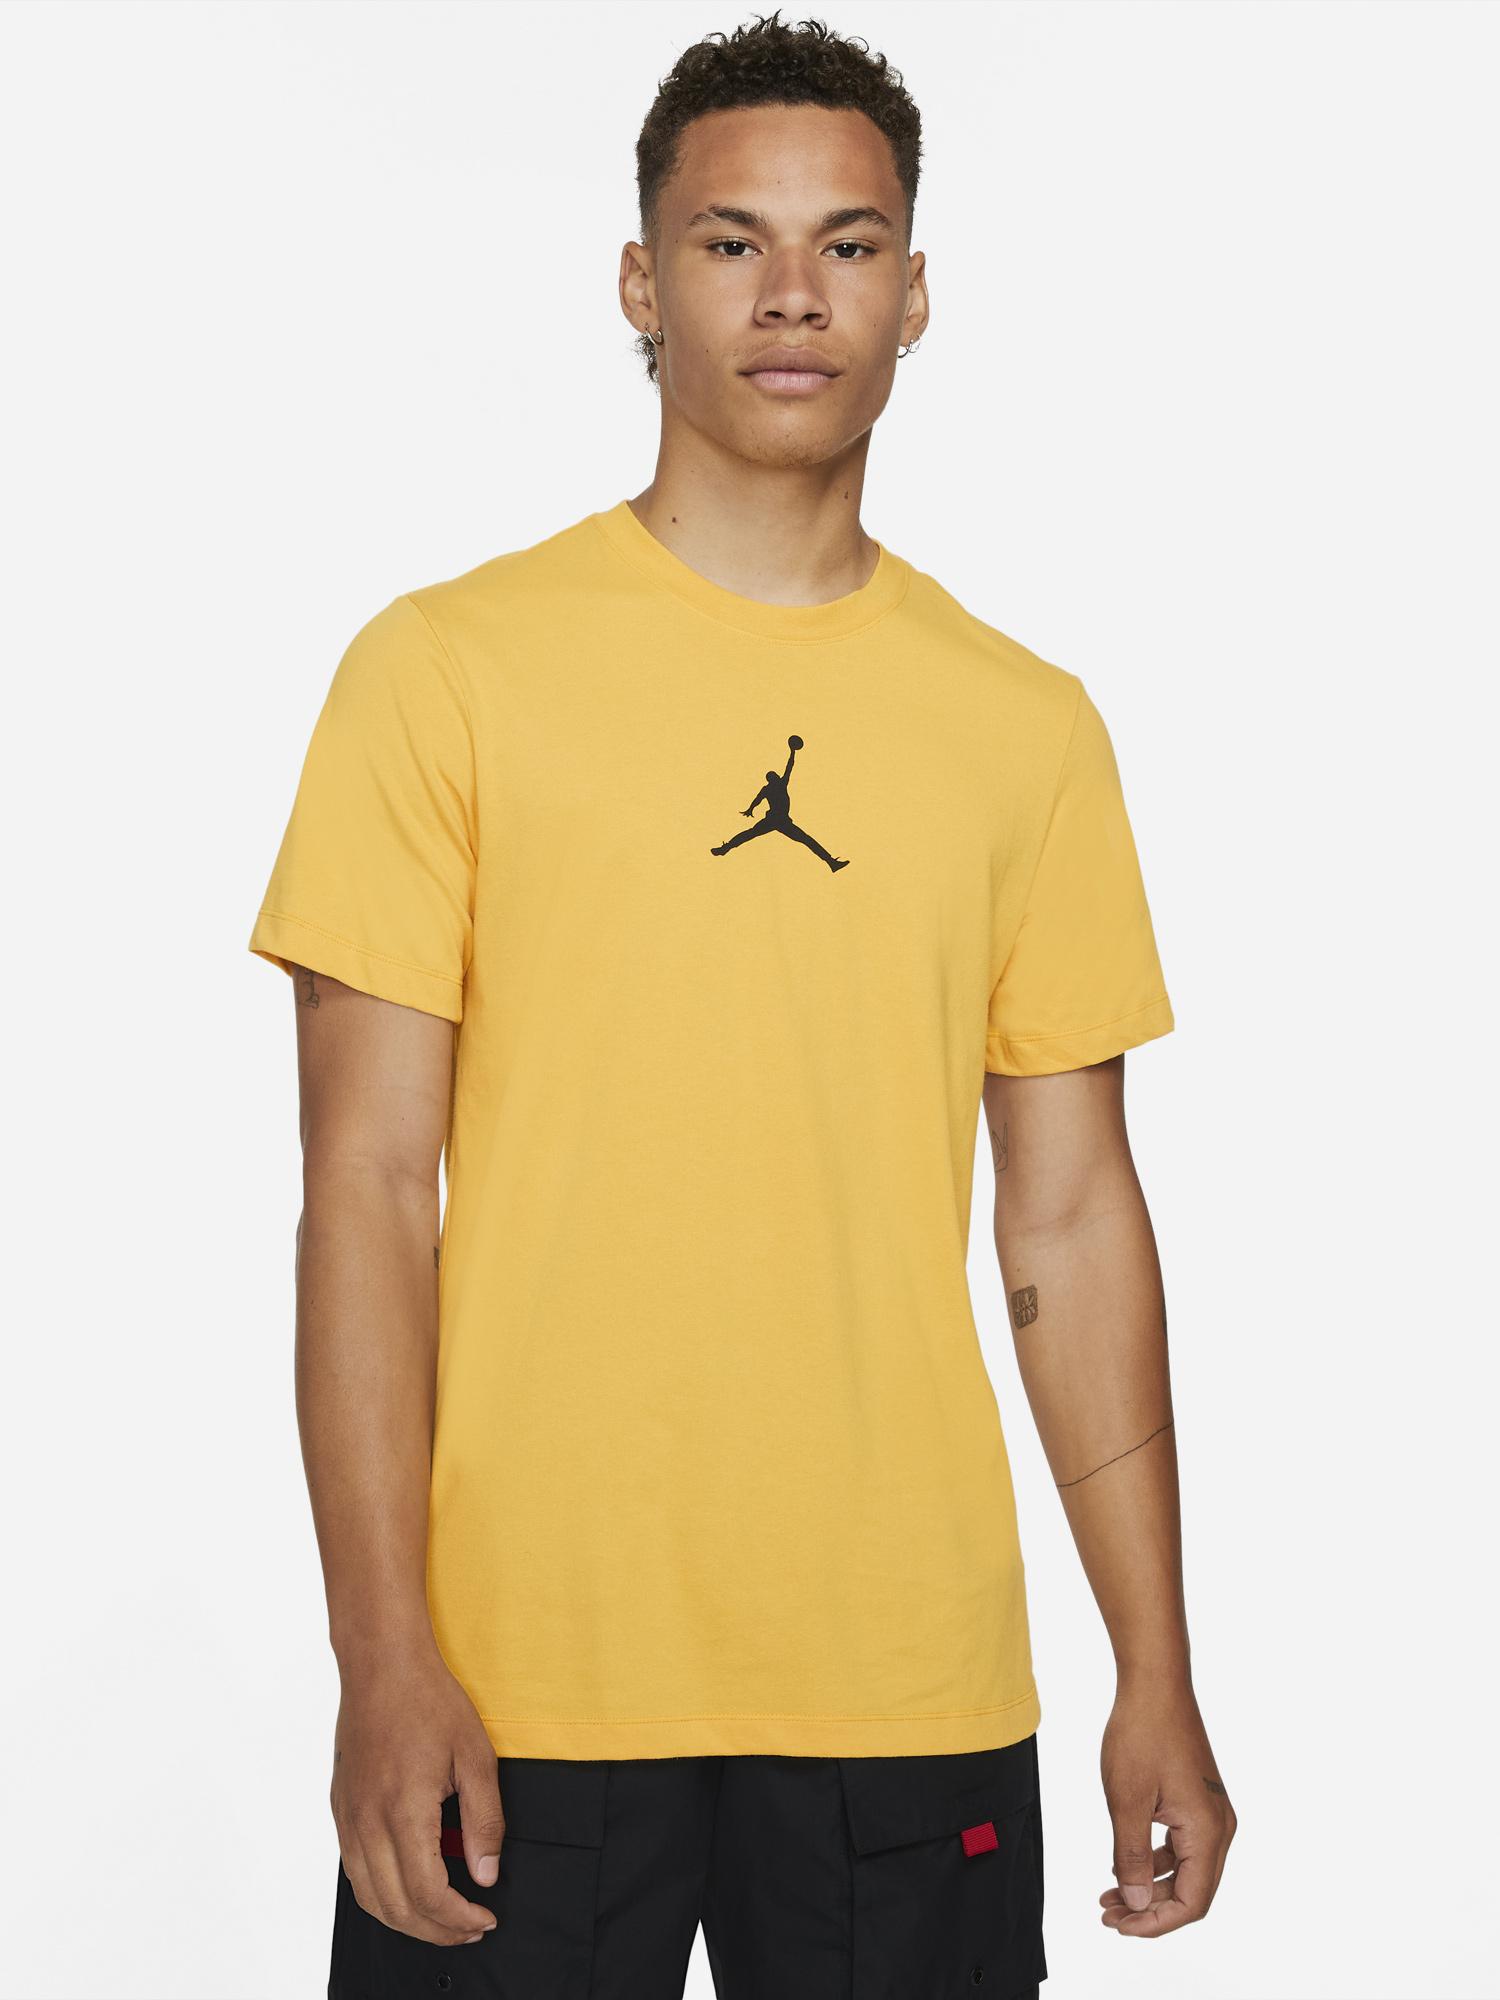 jordan-pollen-dri-fit-shirt-1